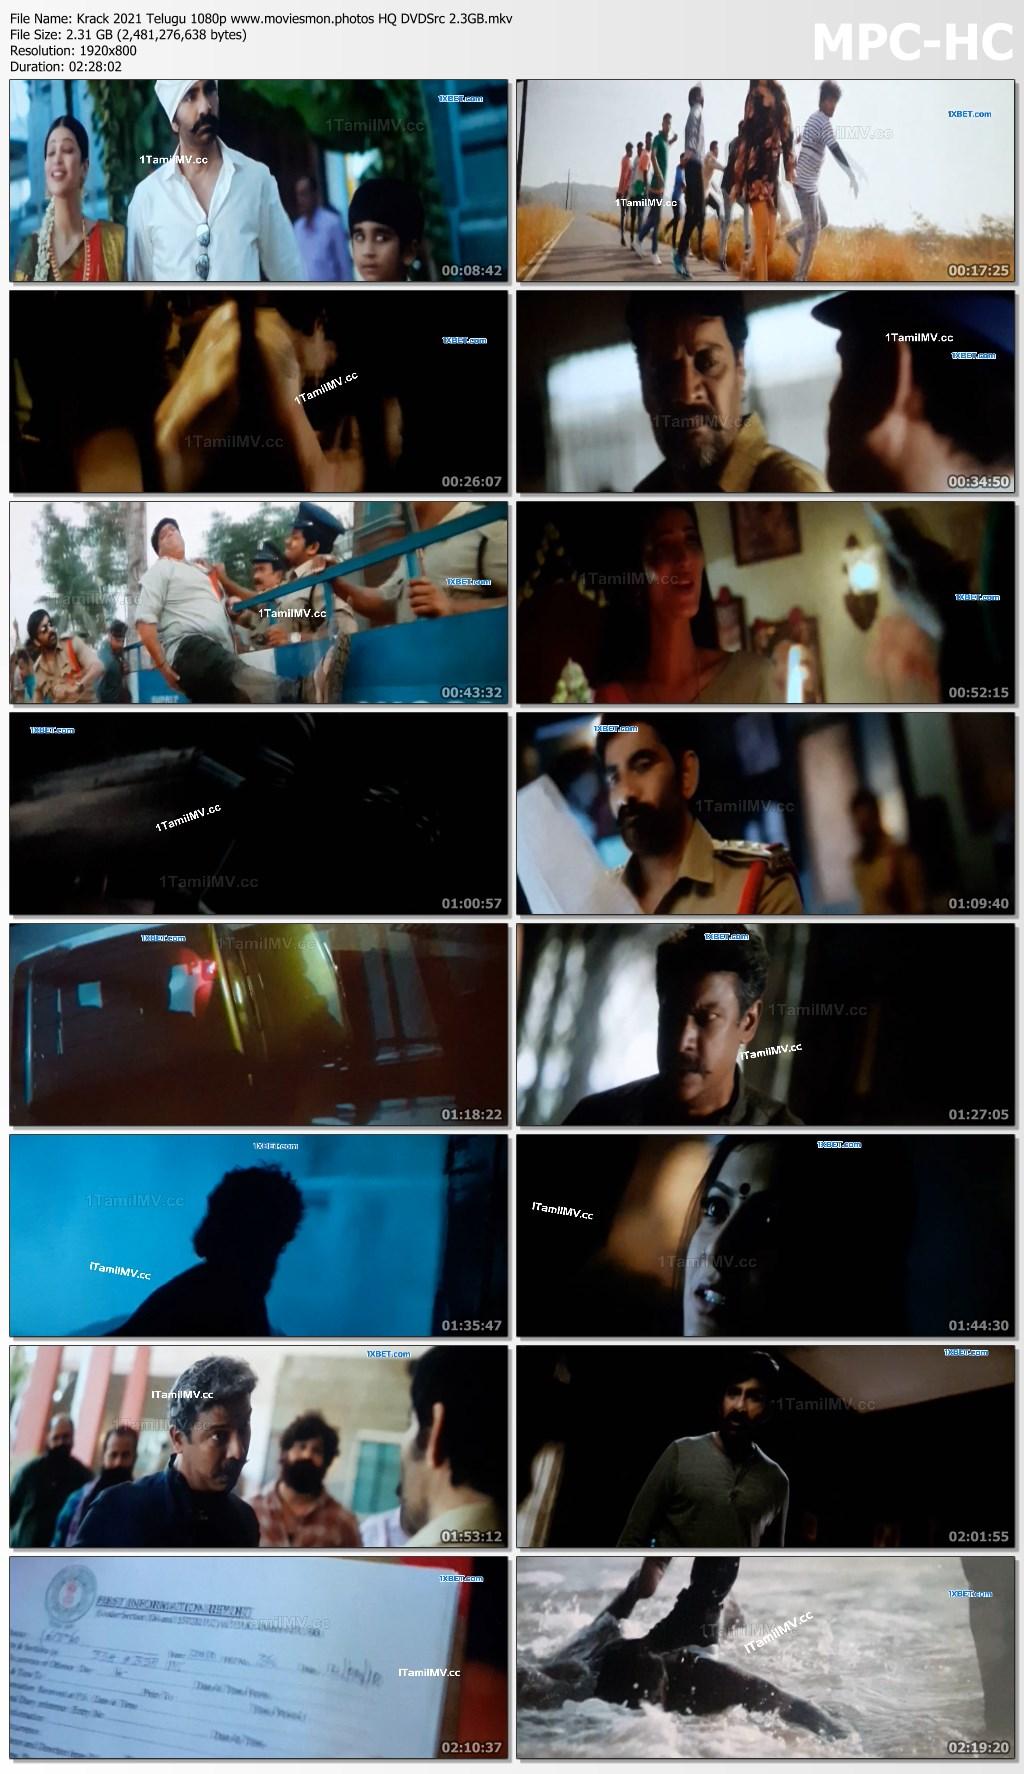 Krack 2021 Telugu Full Movie 1080p HQ DVDSrc 2.4GB Download